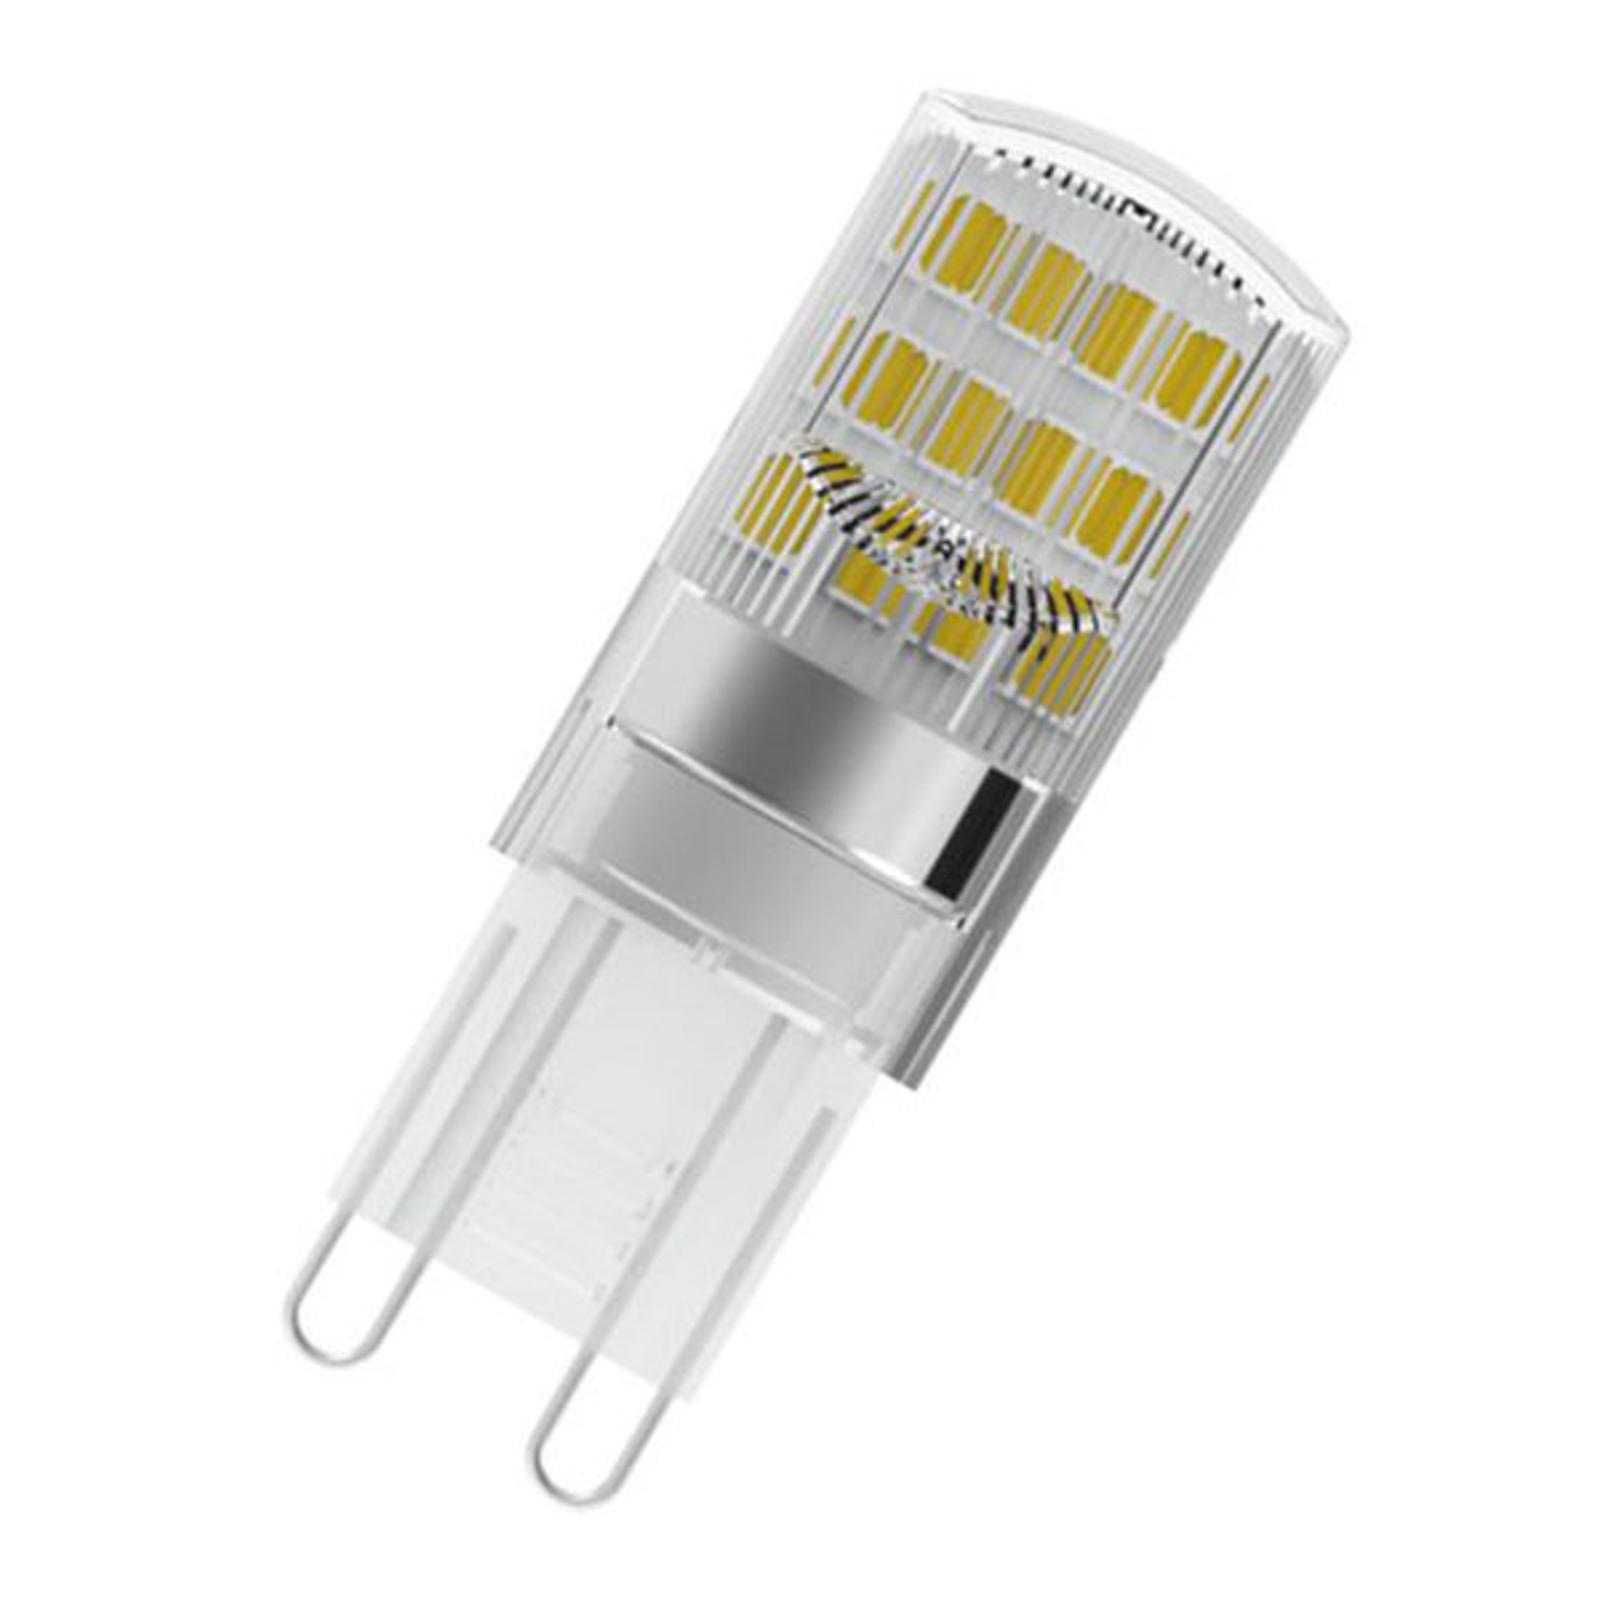 OSRAM LED-Stiftsockellampe G9 1,9W 2.700K klar